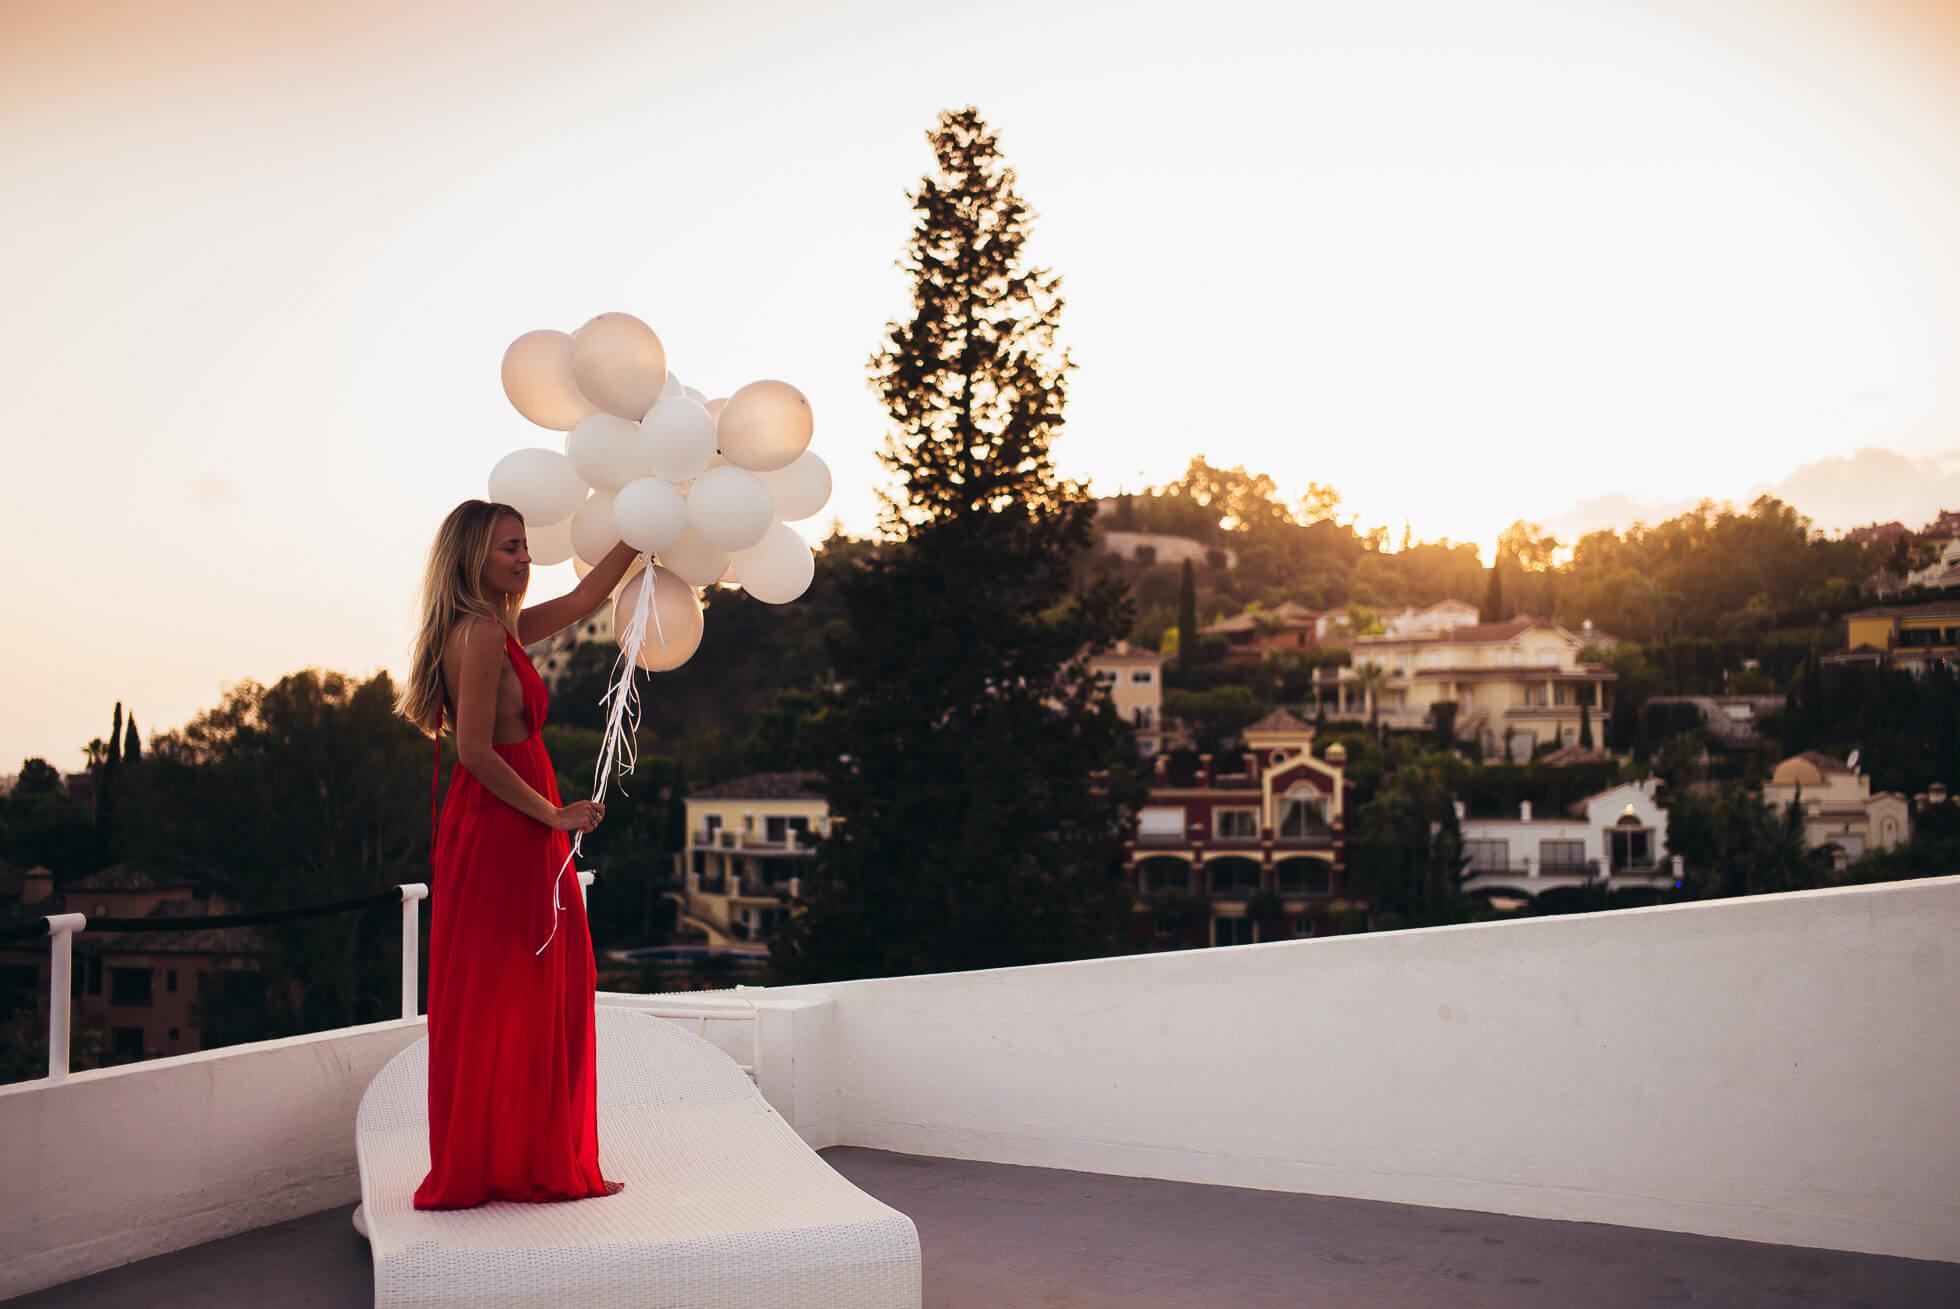 janni-deler-balloon-marbellal1002447-redigera